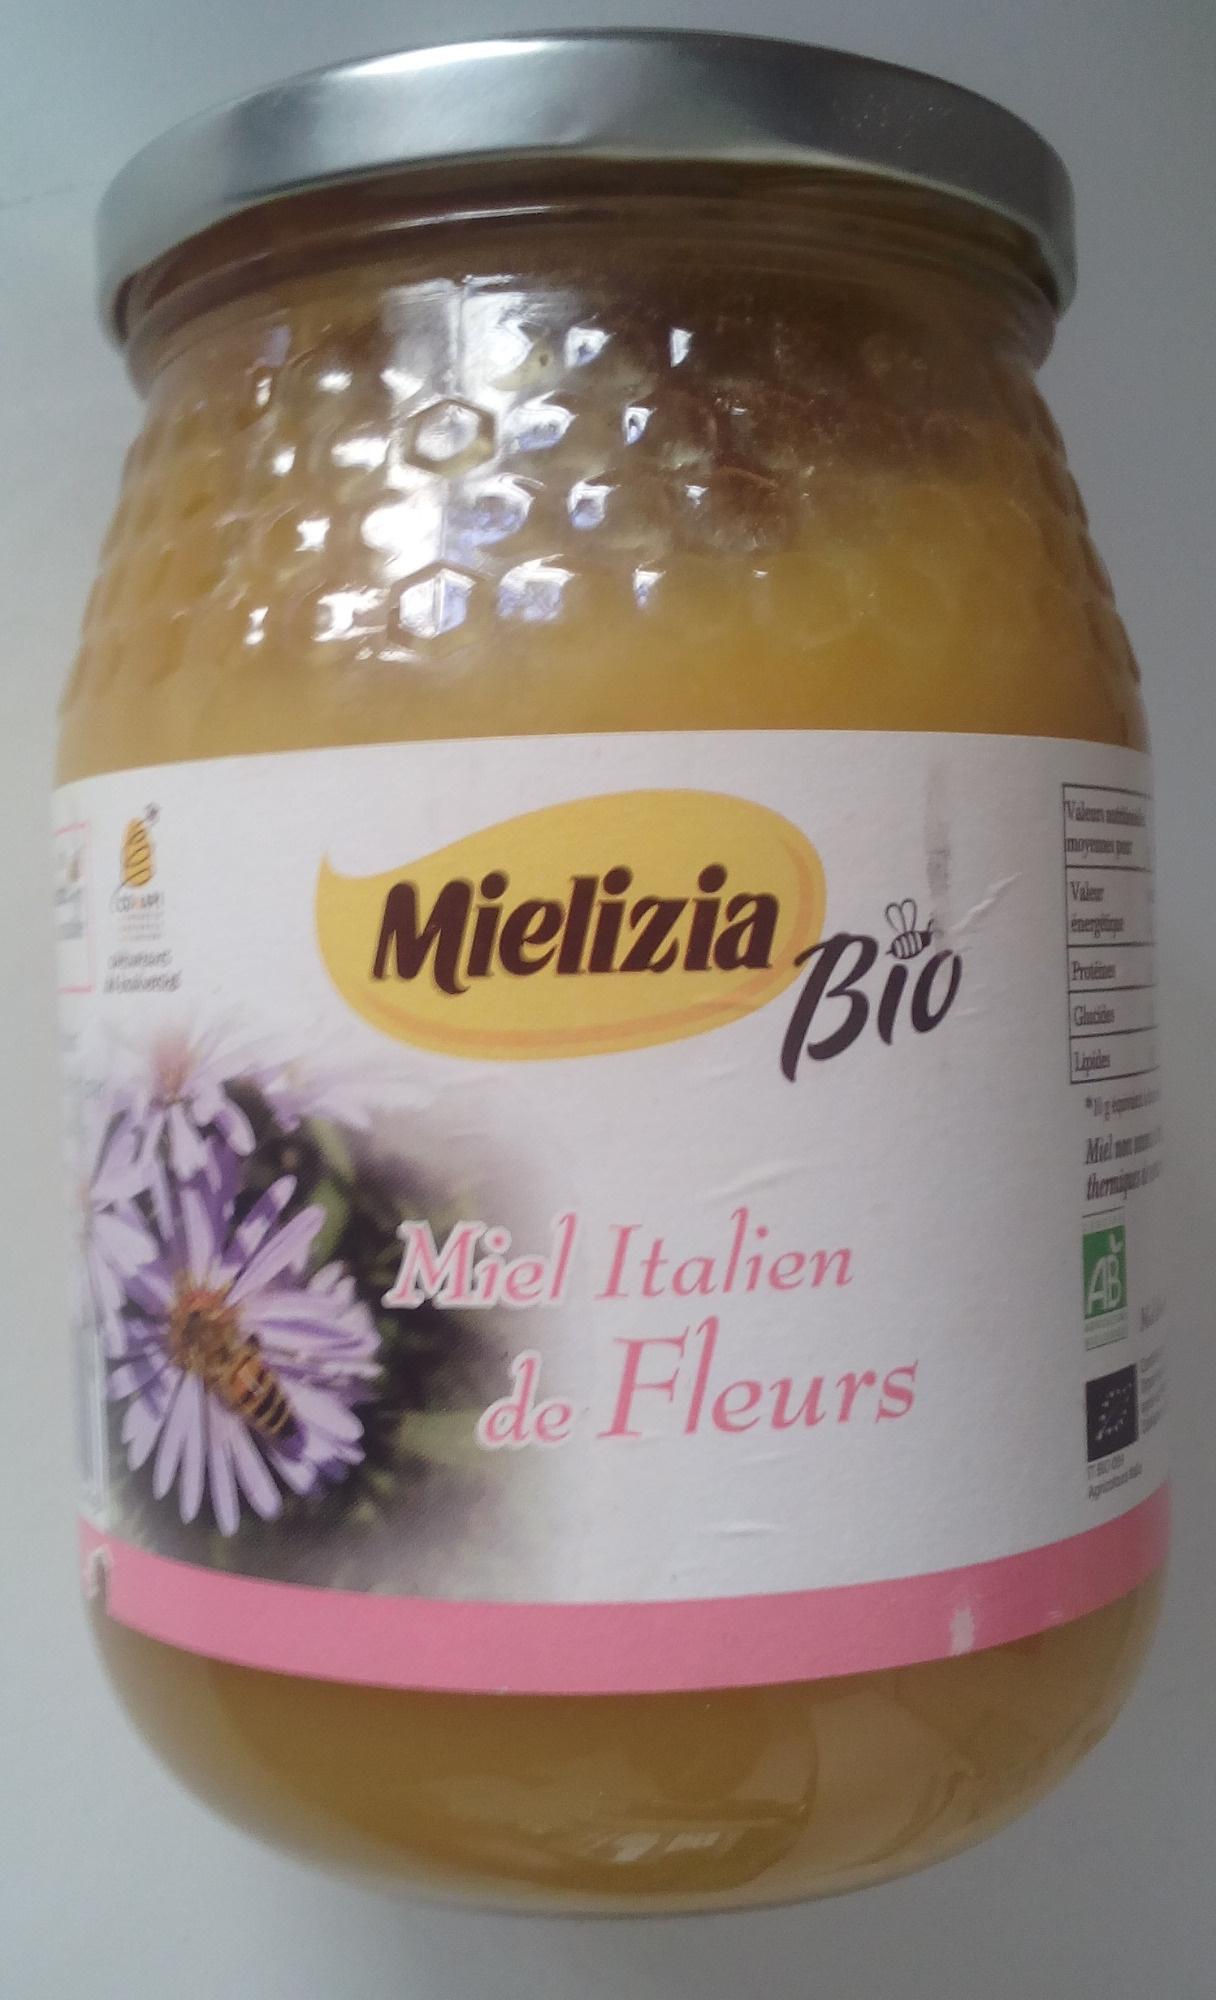 Miel Italien de Fleurs - Producto